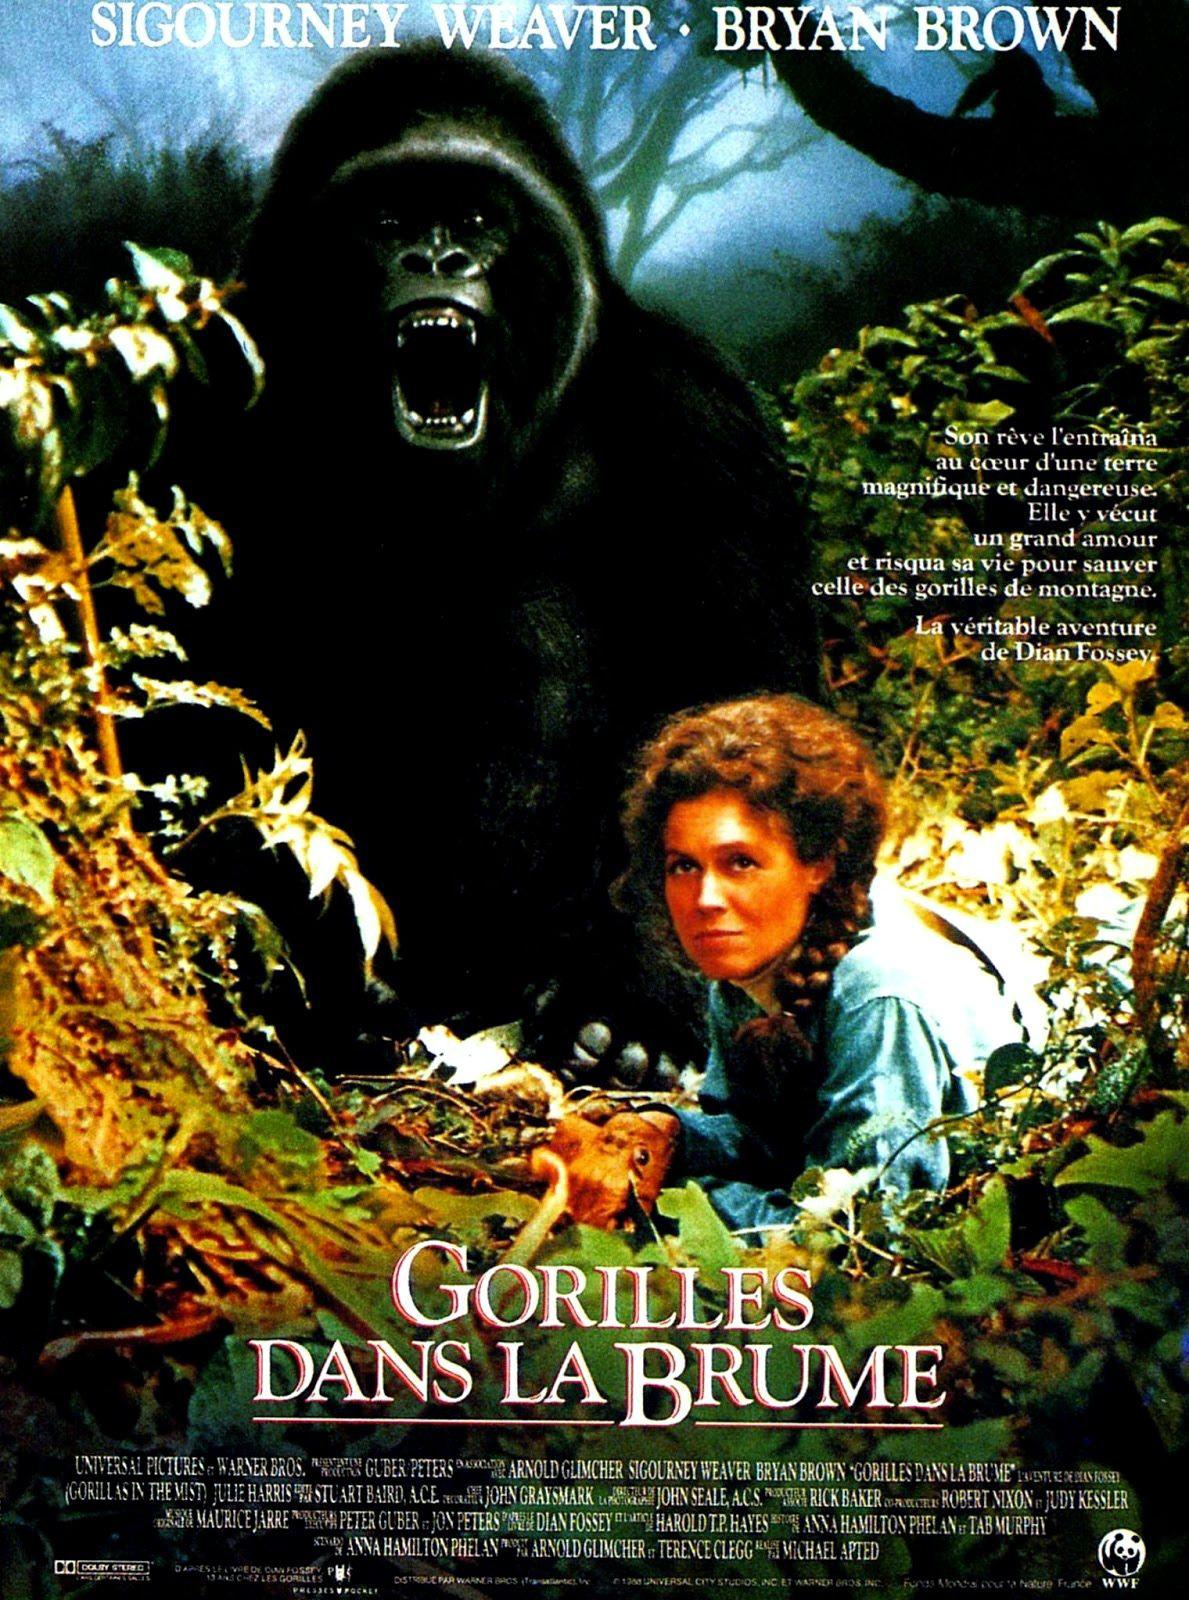 Gorilles dans la brume: Amazon.fr: Sigourney Weaver, Bryan